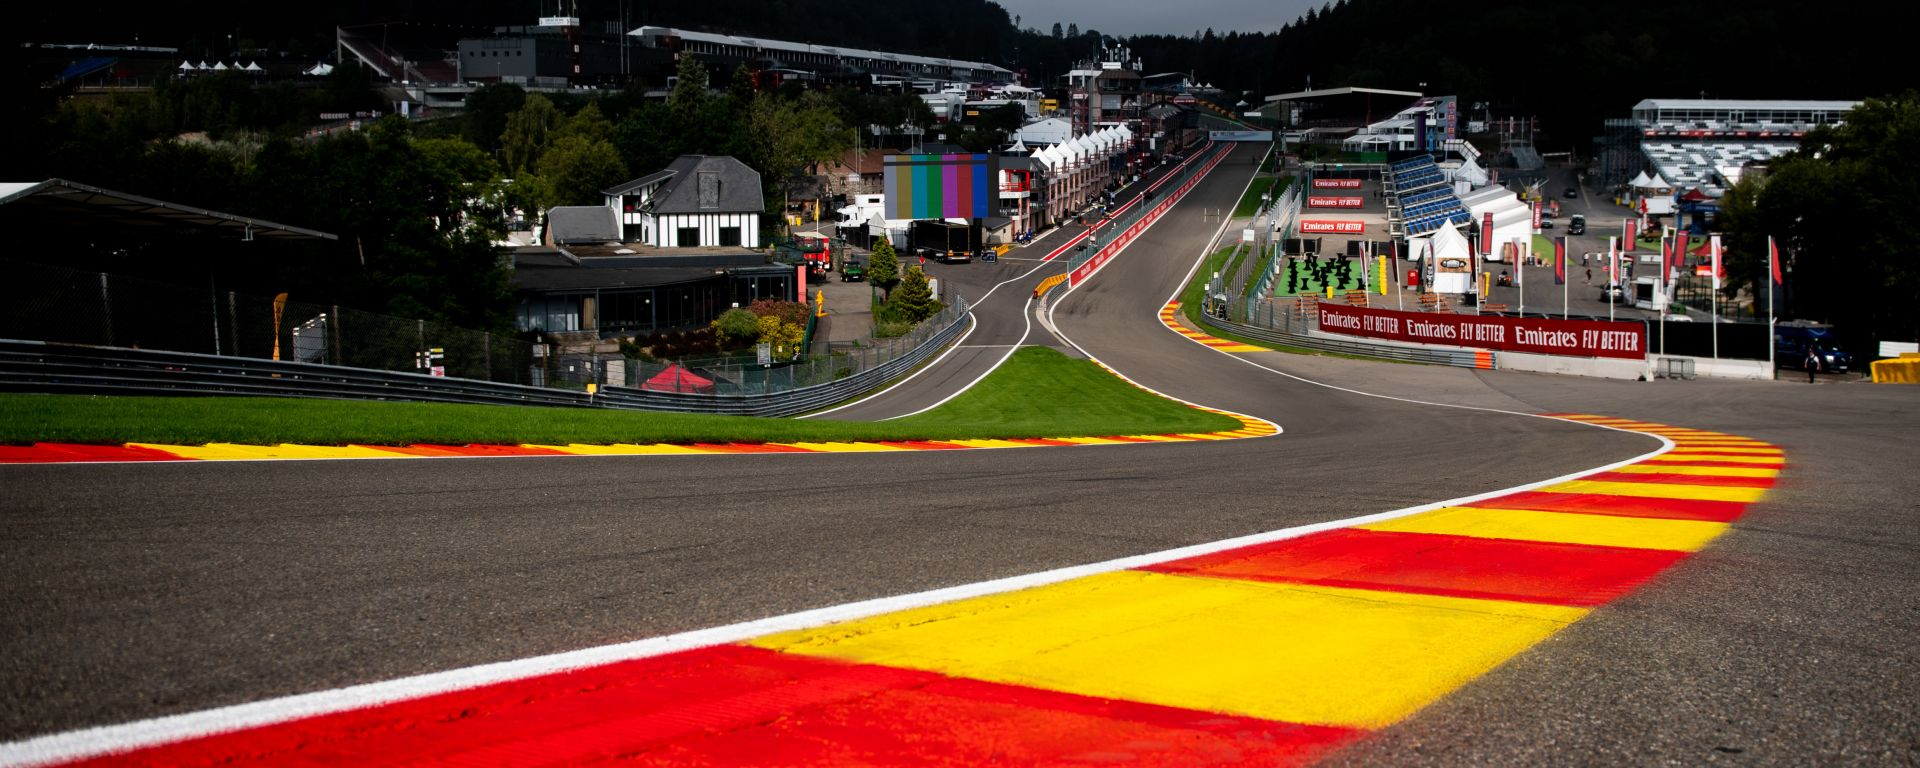 F1, la mitica curva di Eau Rouge protagonista del Gp del Belgio